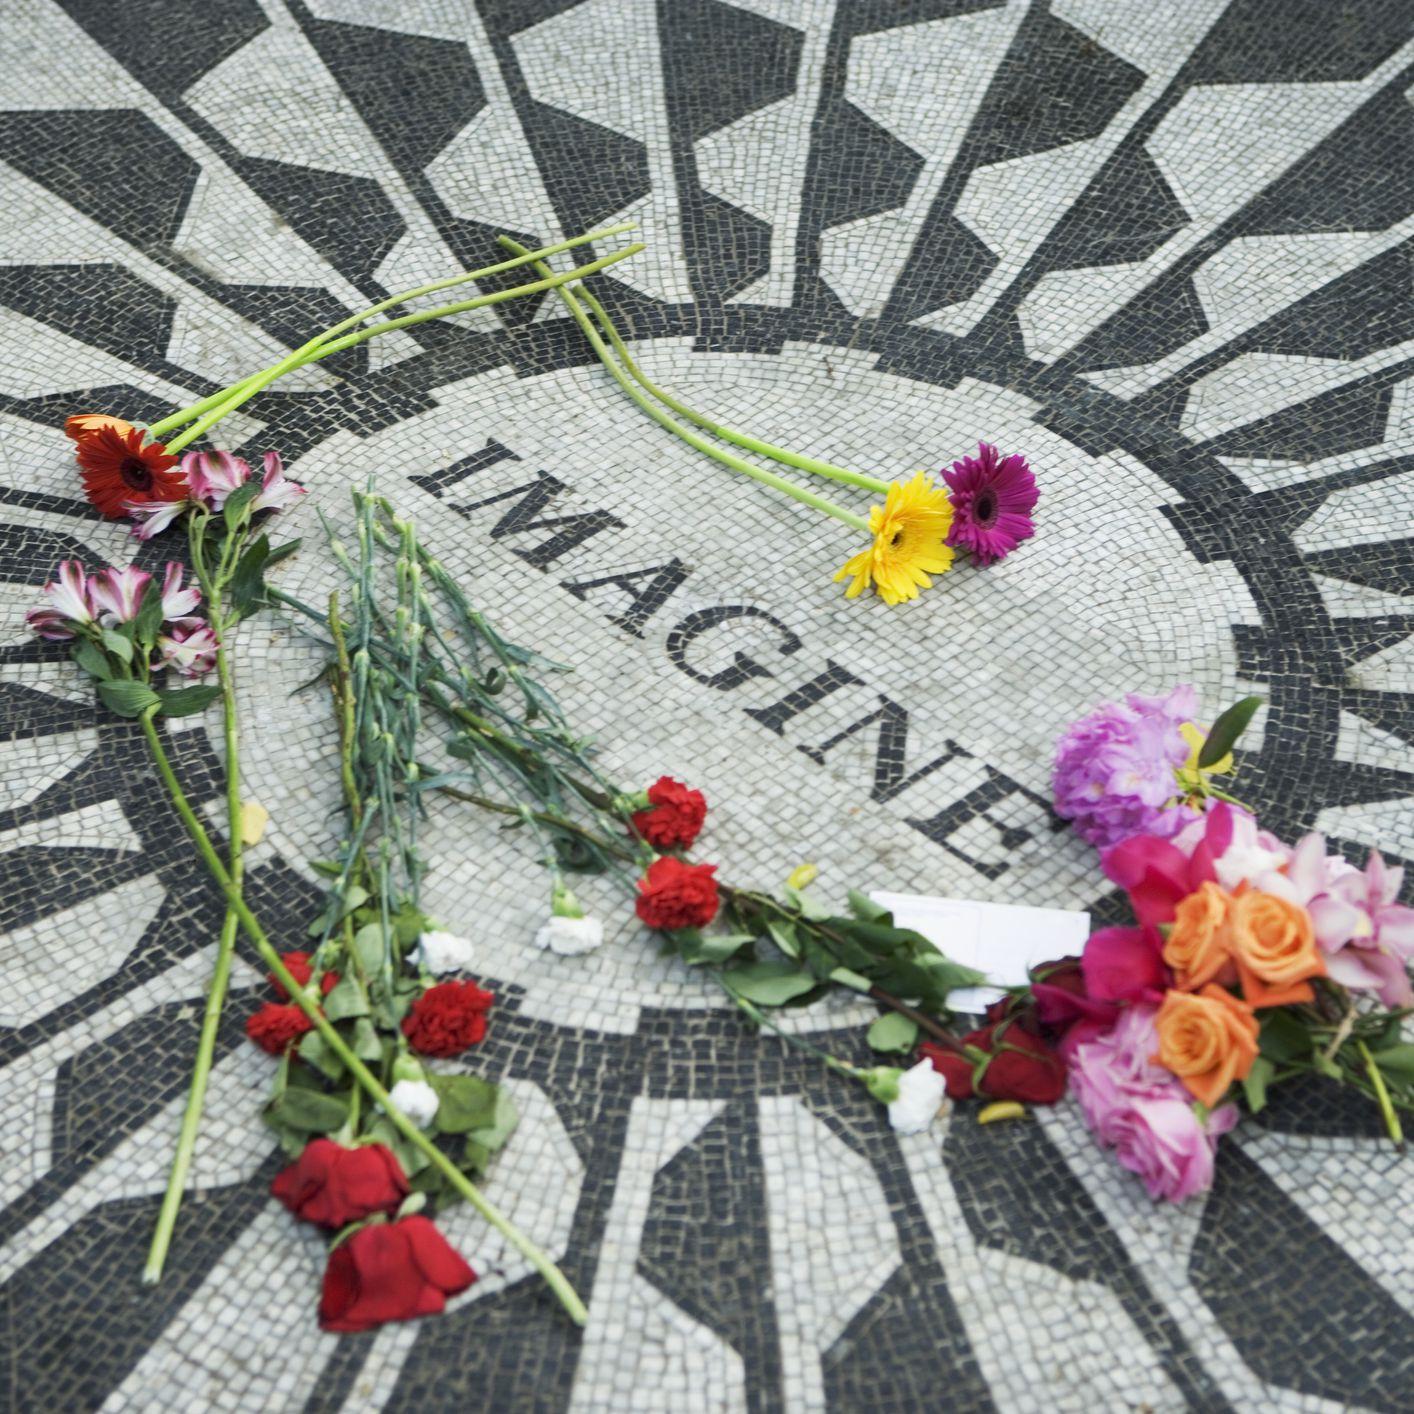 5 Beatles Spots to Visit in the U.S.